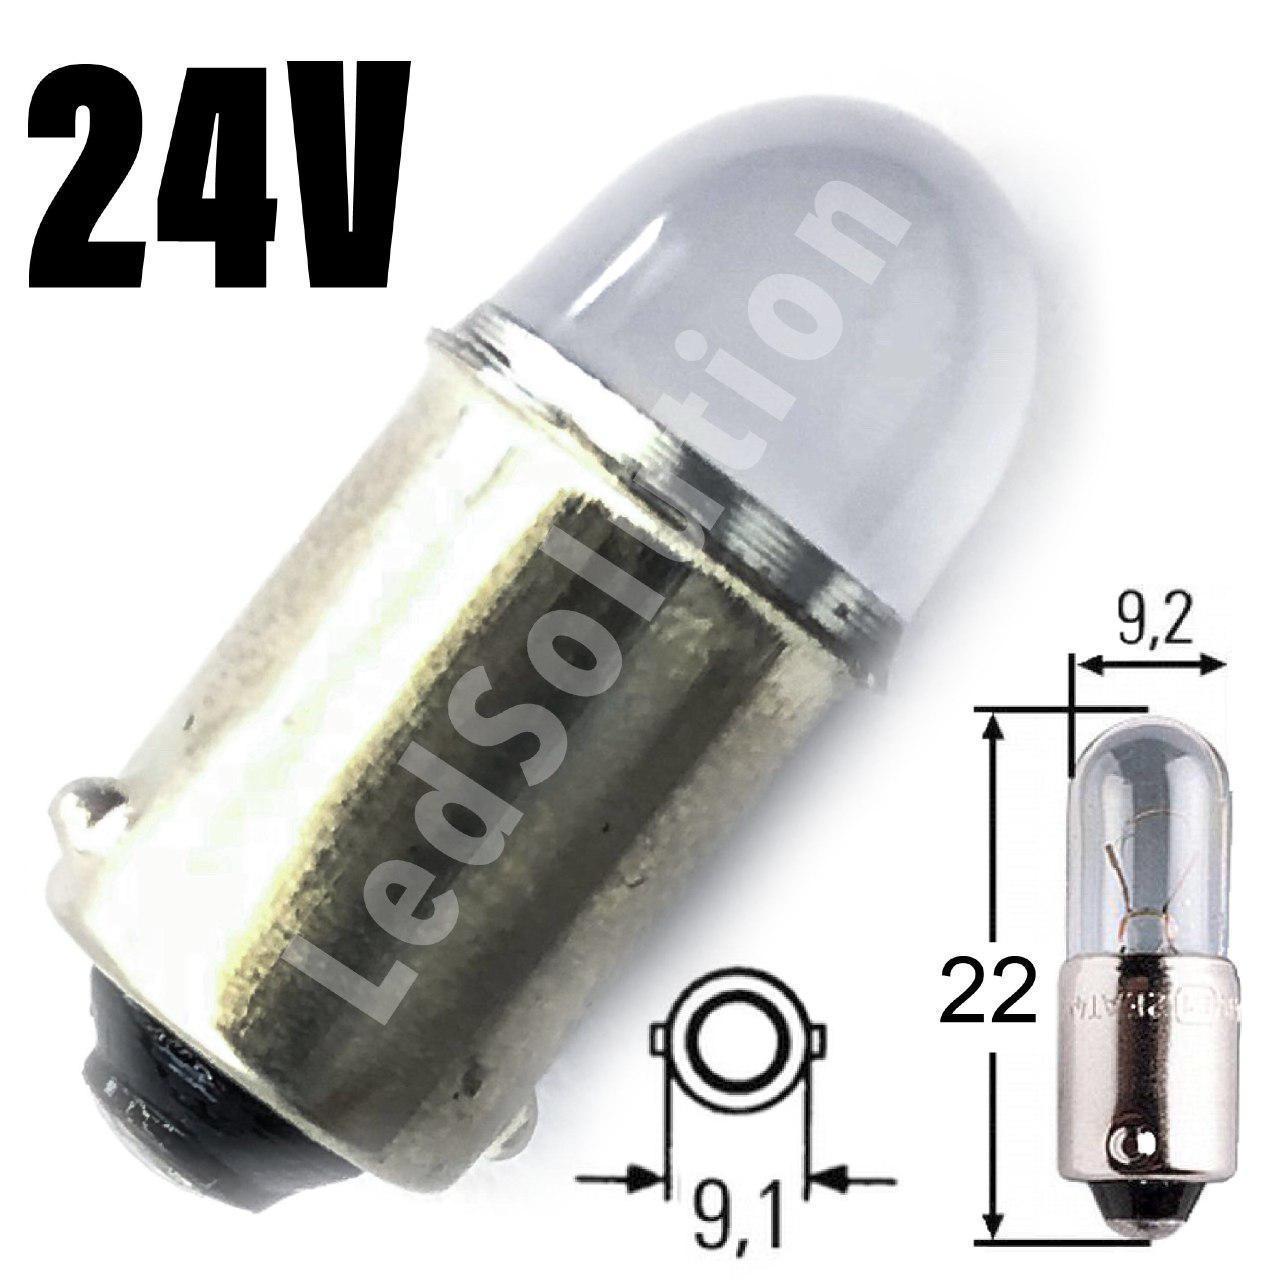 Лампа LED 24V T4W (BA9s) 2smd 2835 Osram куля 28Lm ЧЕРВОНИЙ